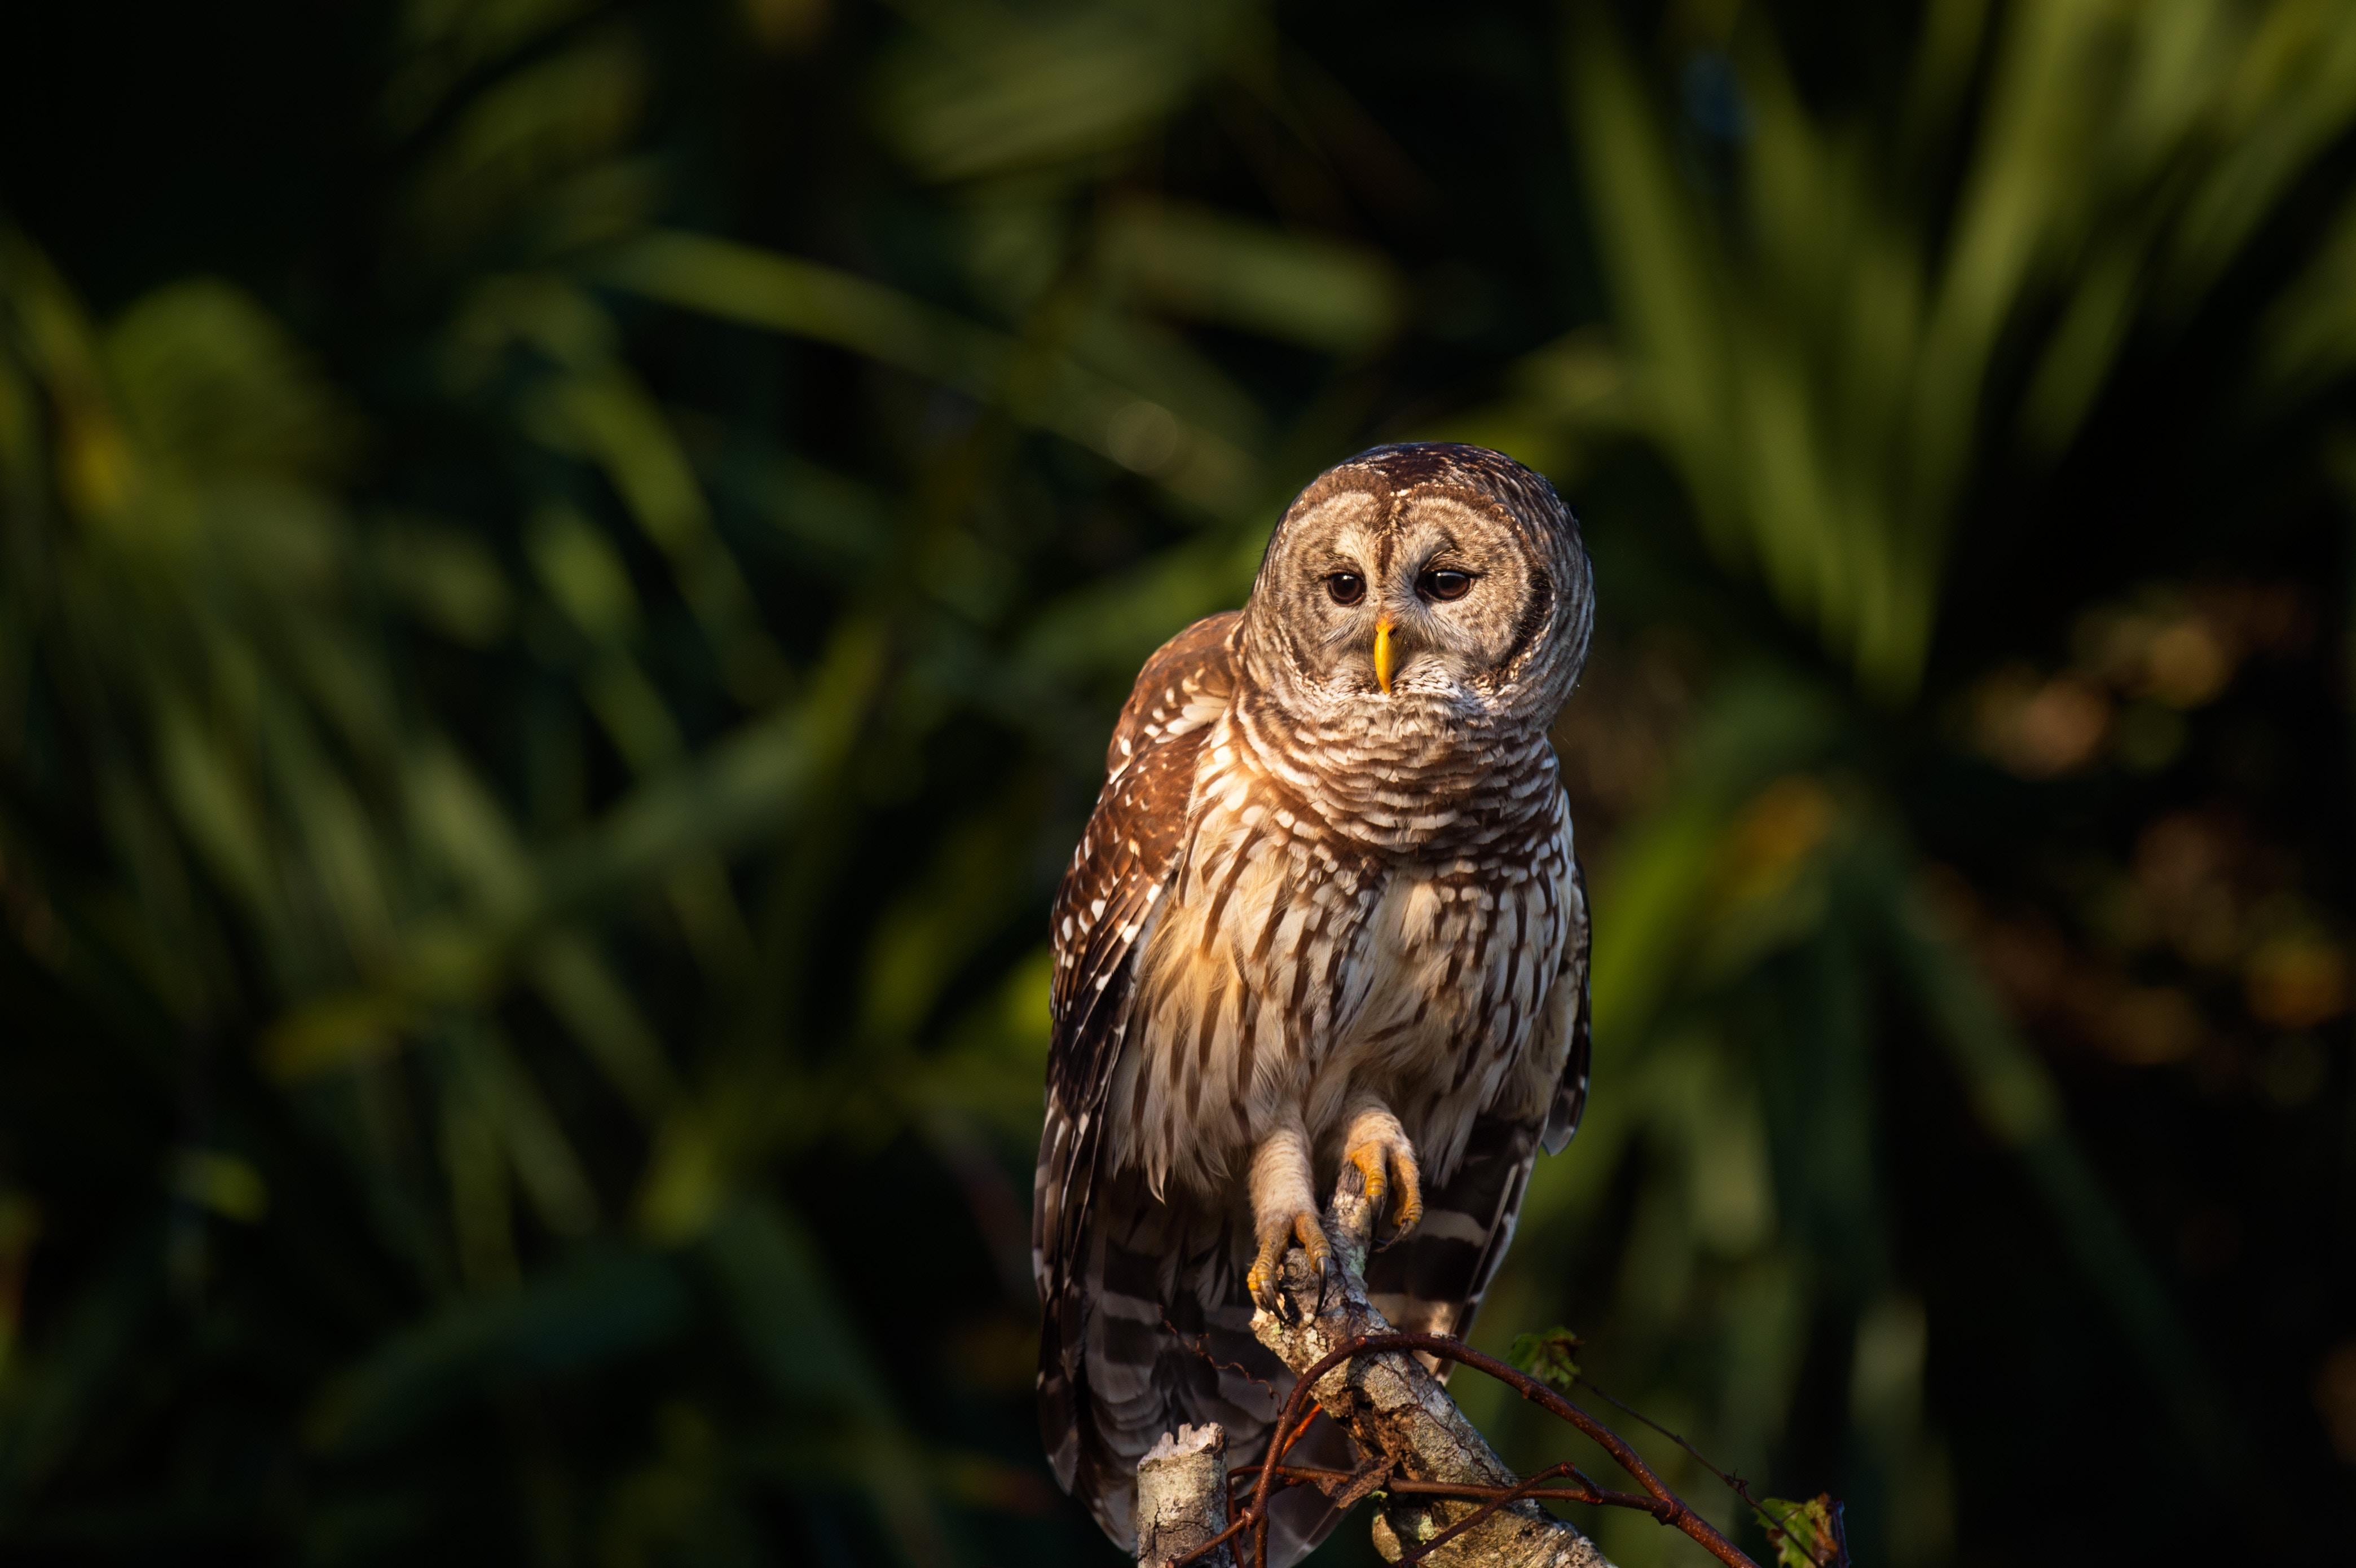 Bird-watching-owl-ray-hennessy-1480293-unsplash